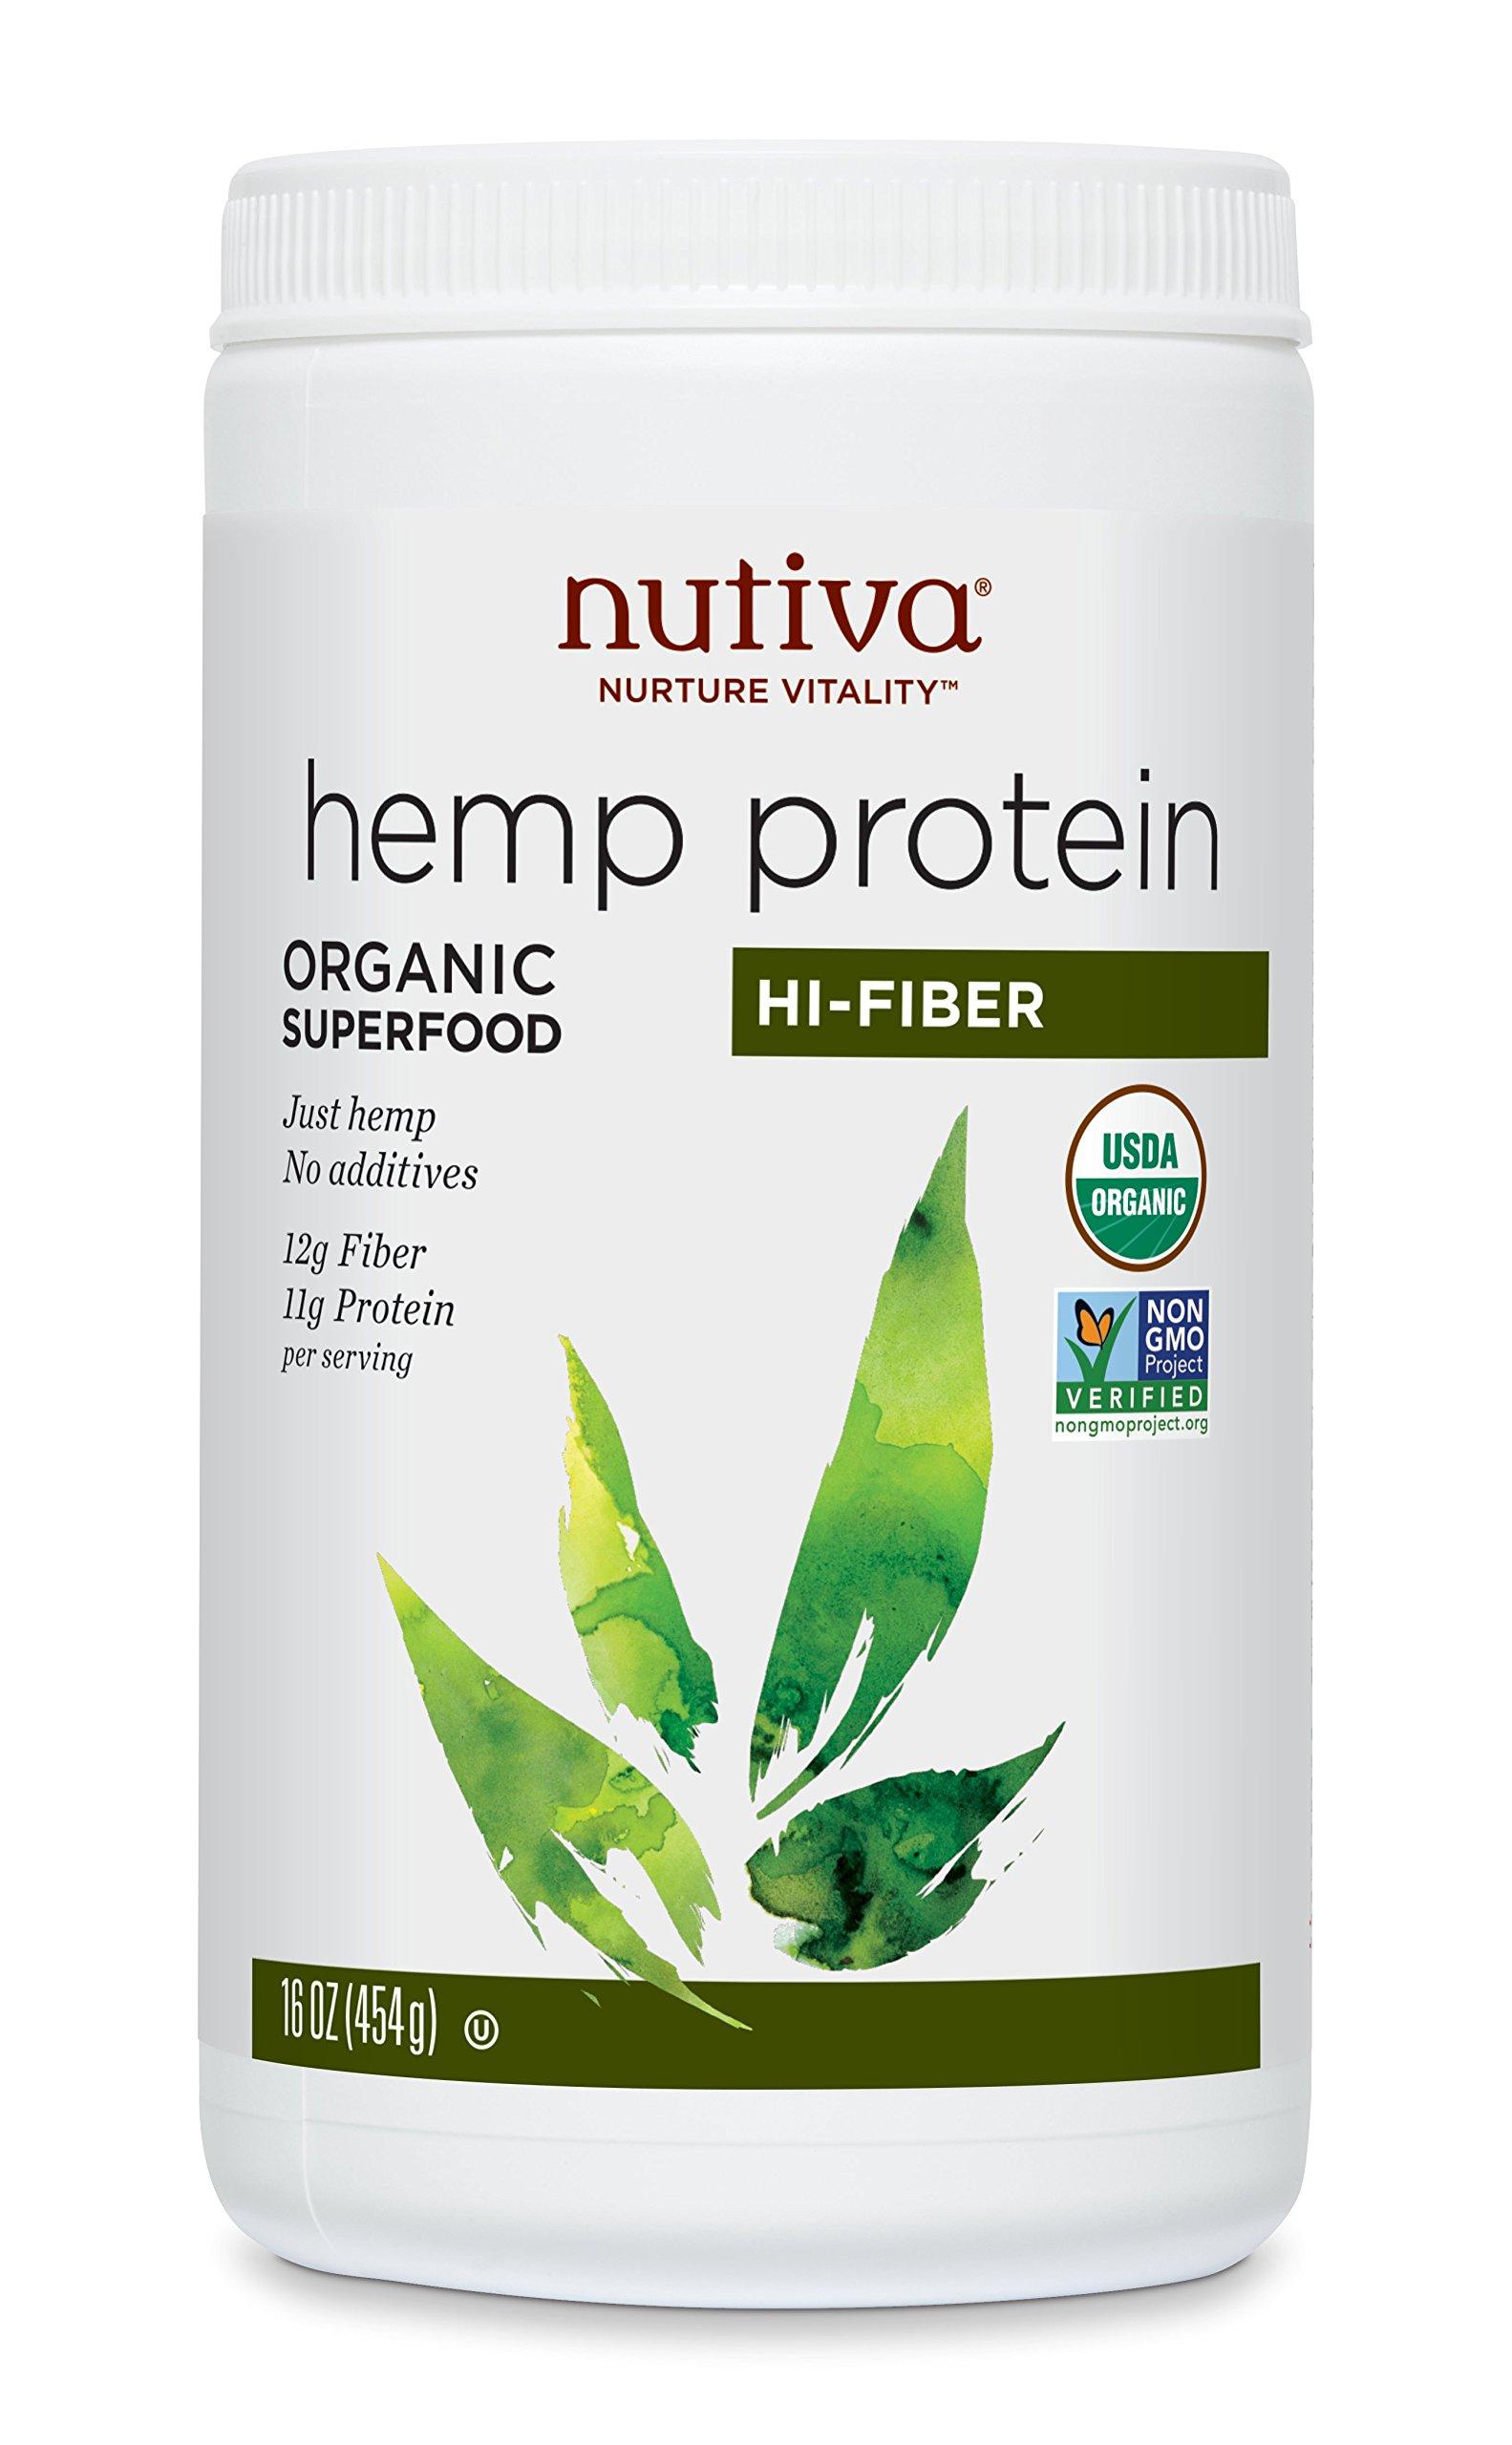 Nutiva Organic, Cold-Processed Hemp Protein from non-GMO, Sustainably Farmed Canadian Hempseed, Hi-Fiber, 16-Ounce